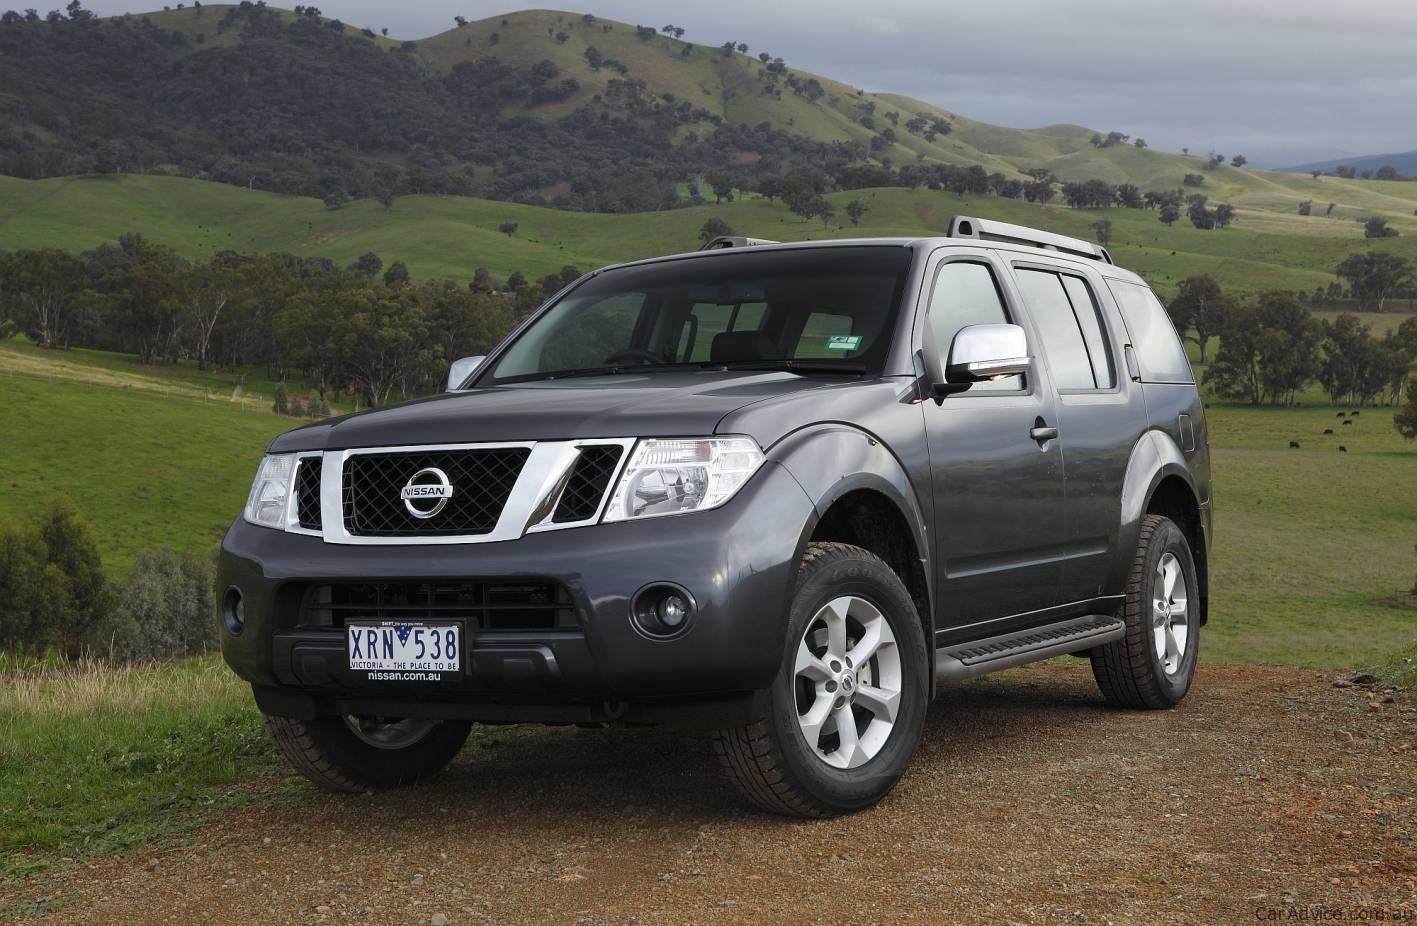 2010 Nissan Pathfinder Range Revised